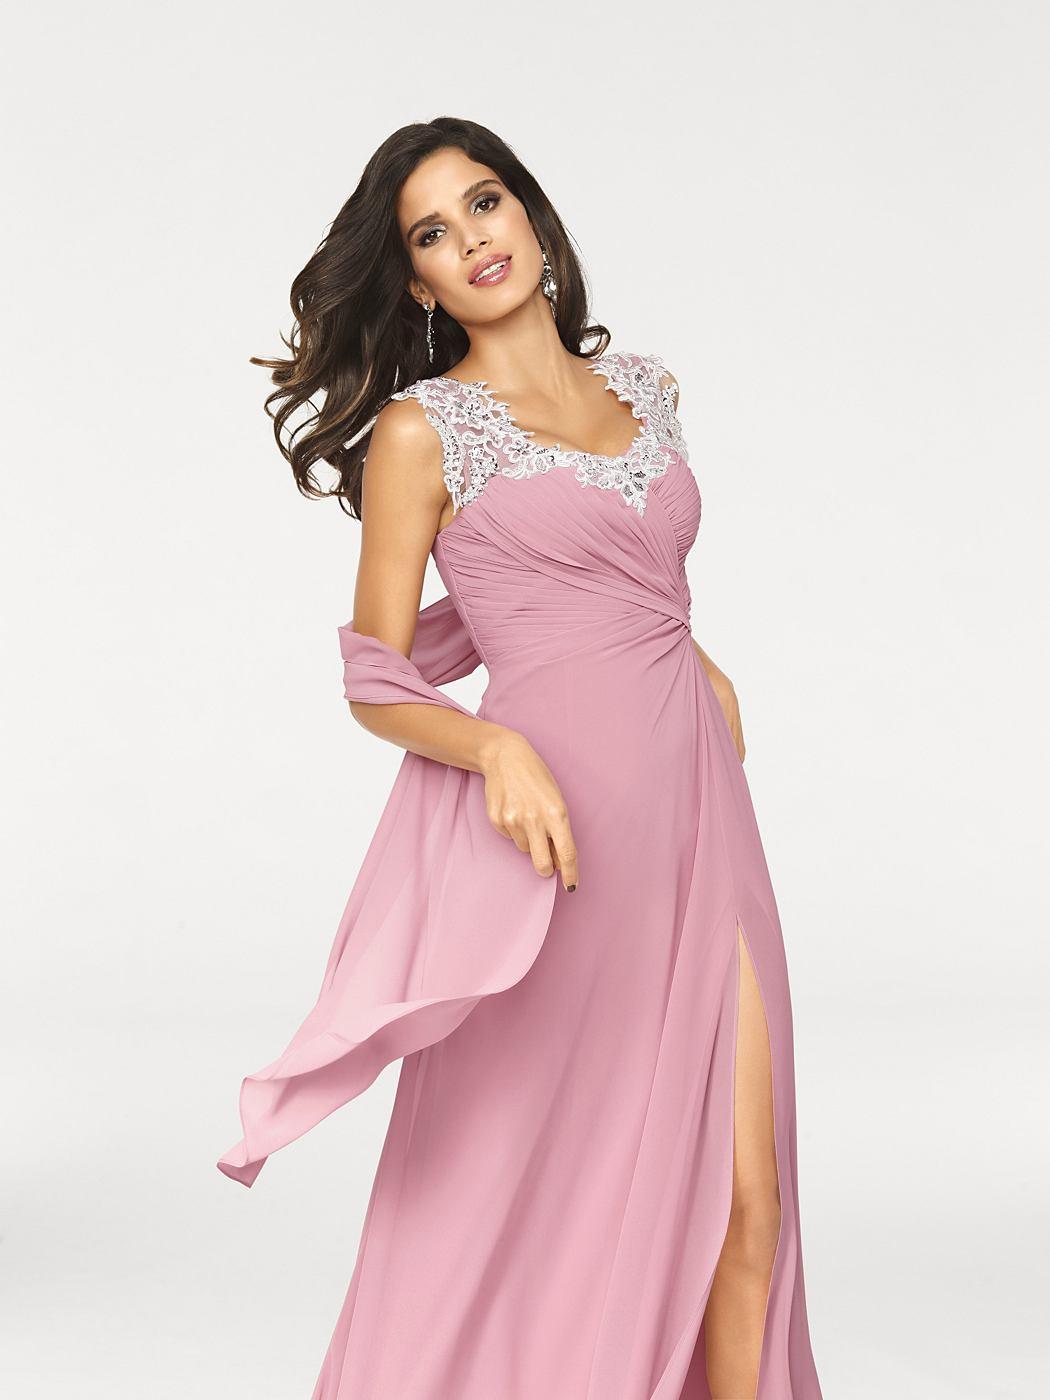 Ashley Brooke Avondjurk roze